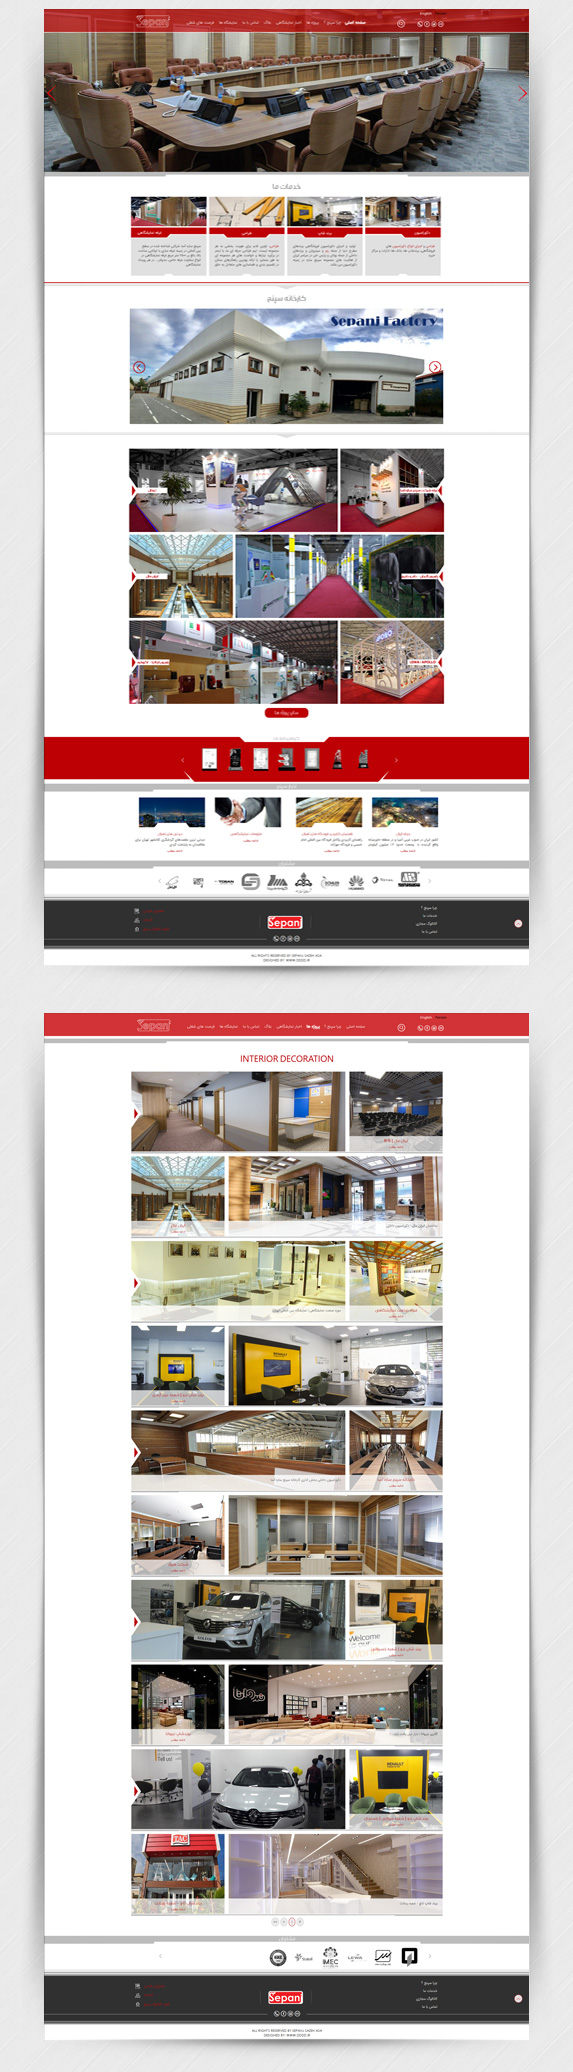 طراحی سایت شرکت سپنج